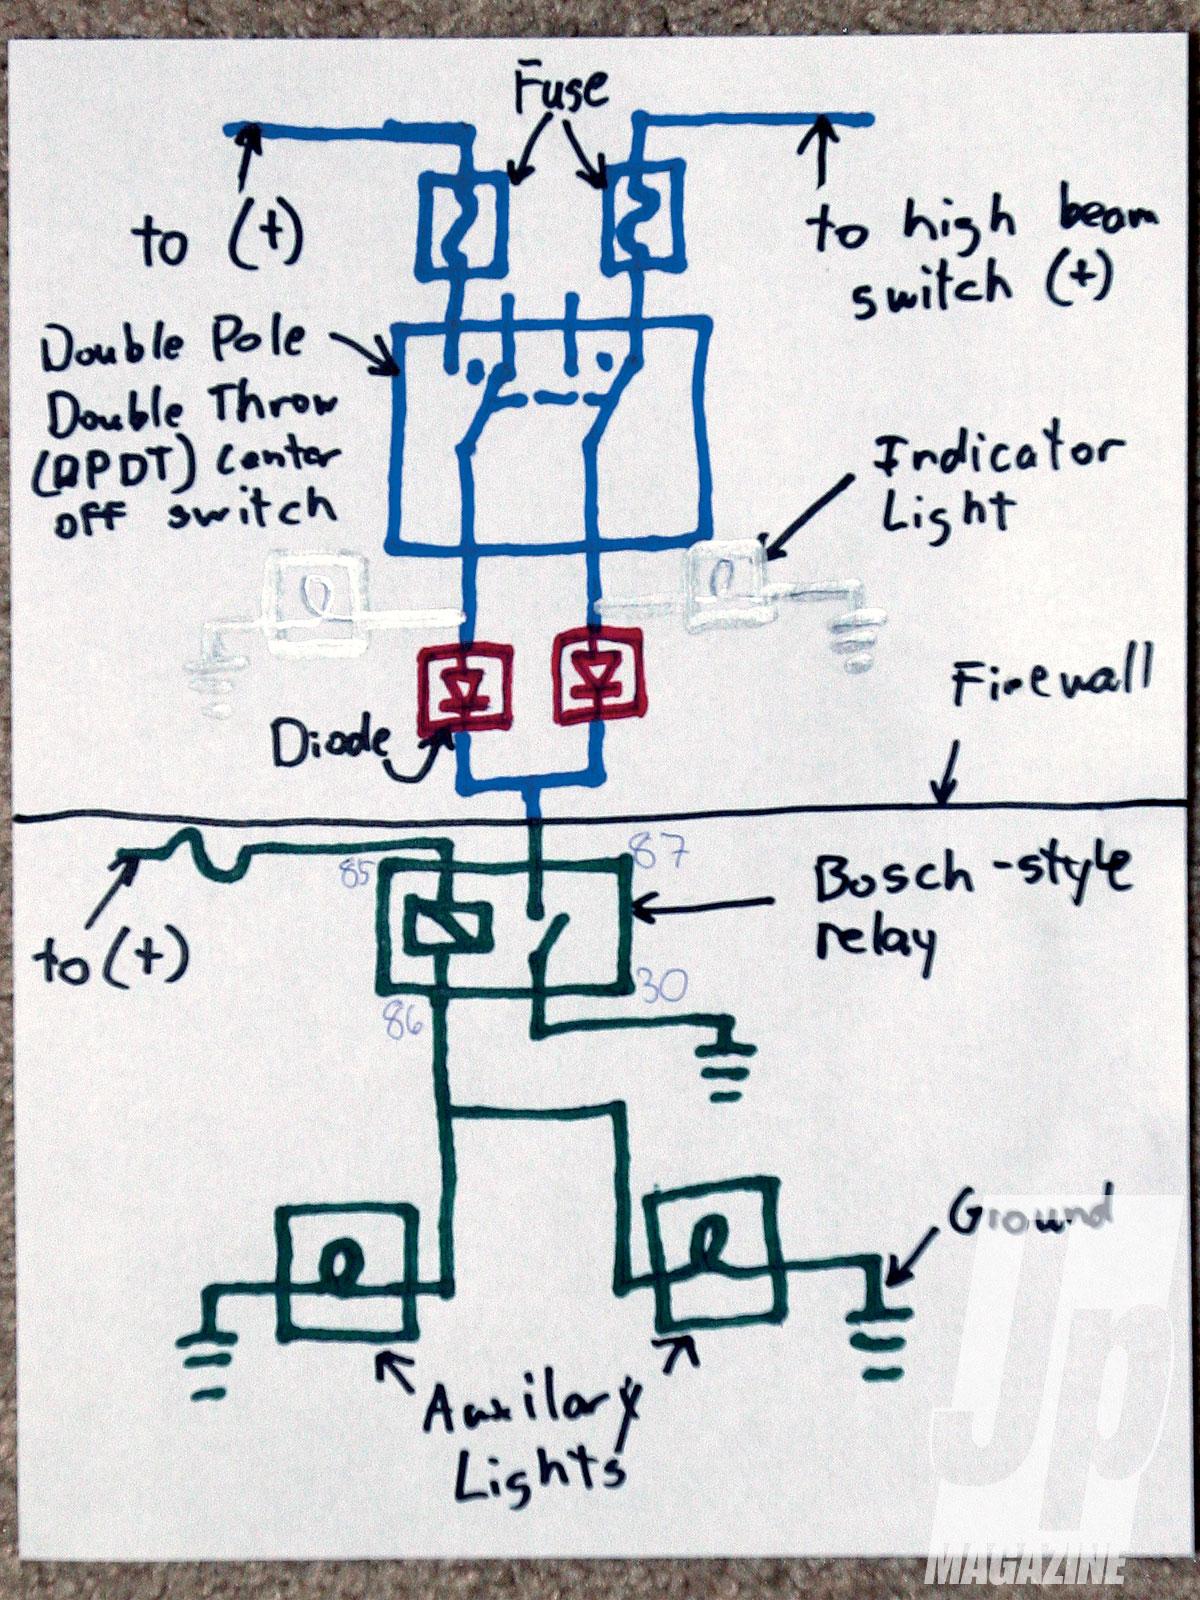 154 1011 november 2010 randys electrical corner complicated wiring diagram photo 05 [ 1200 x 1600 Pixel ]